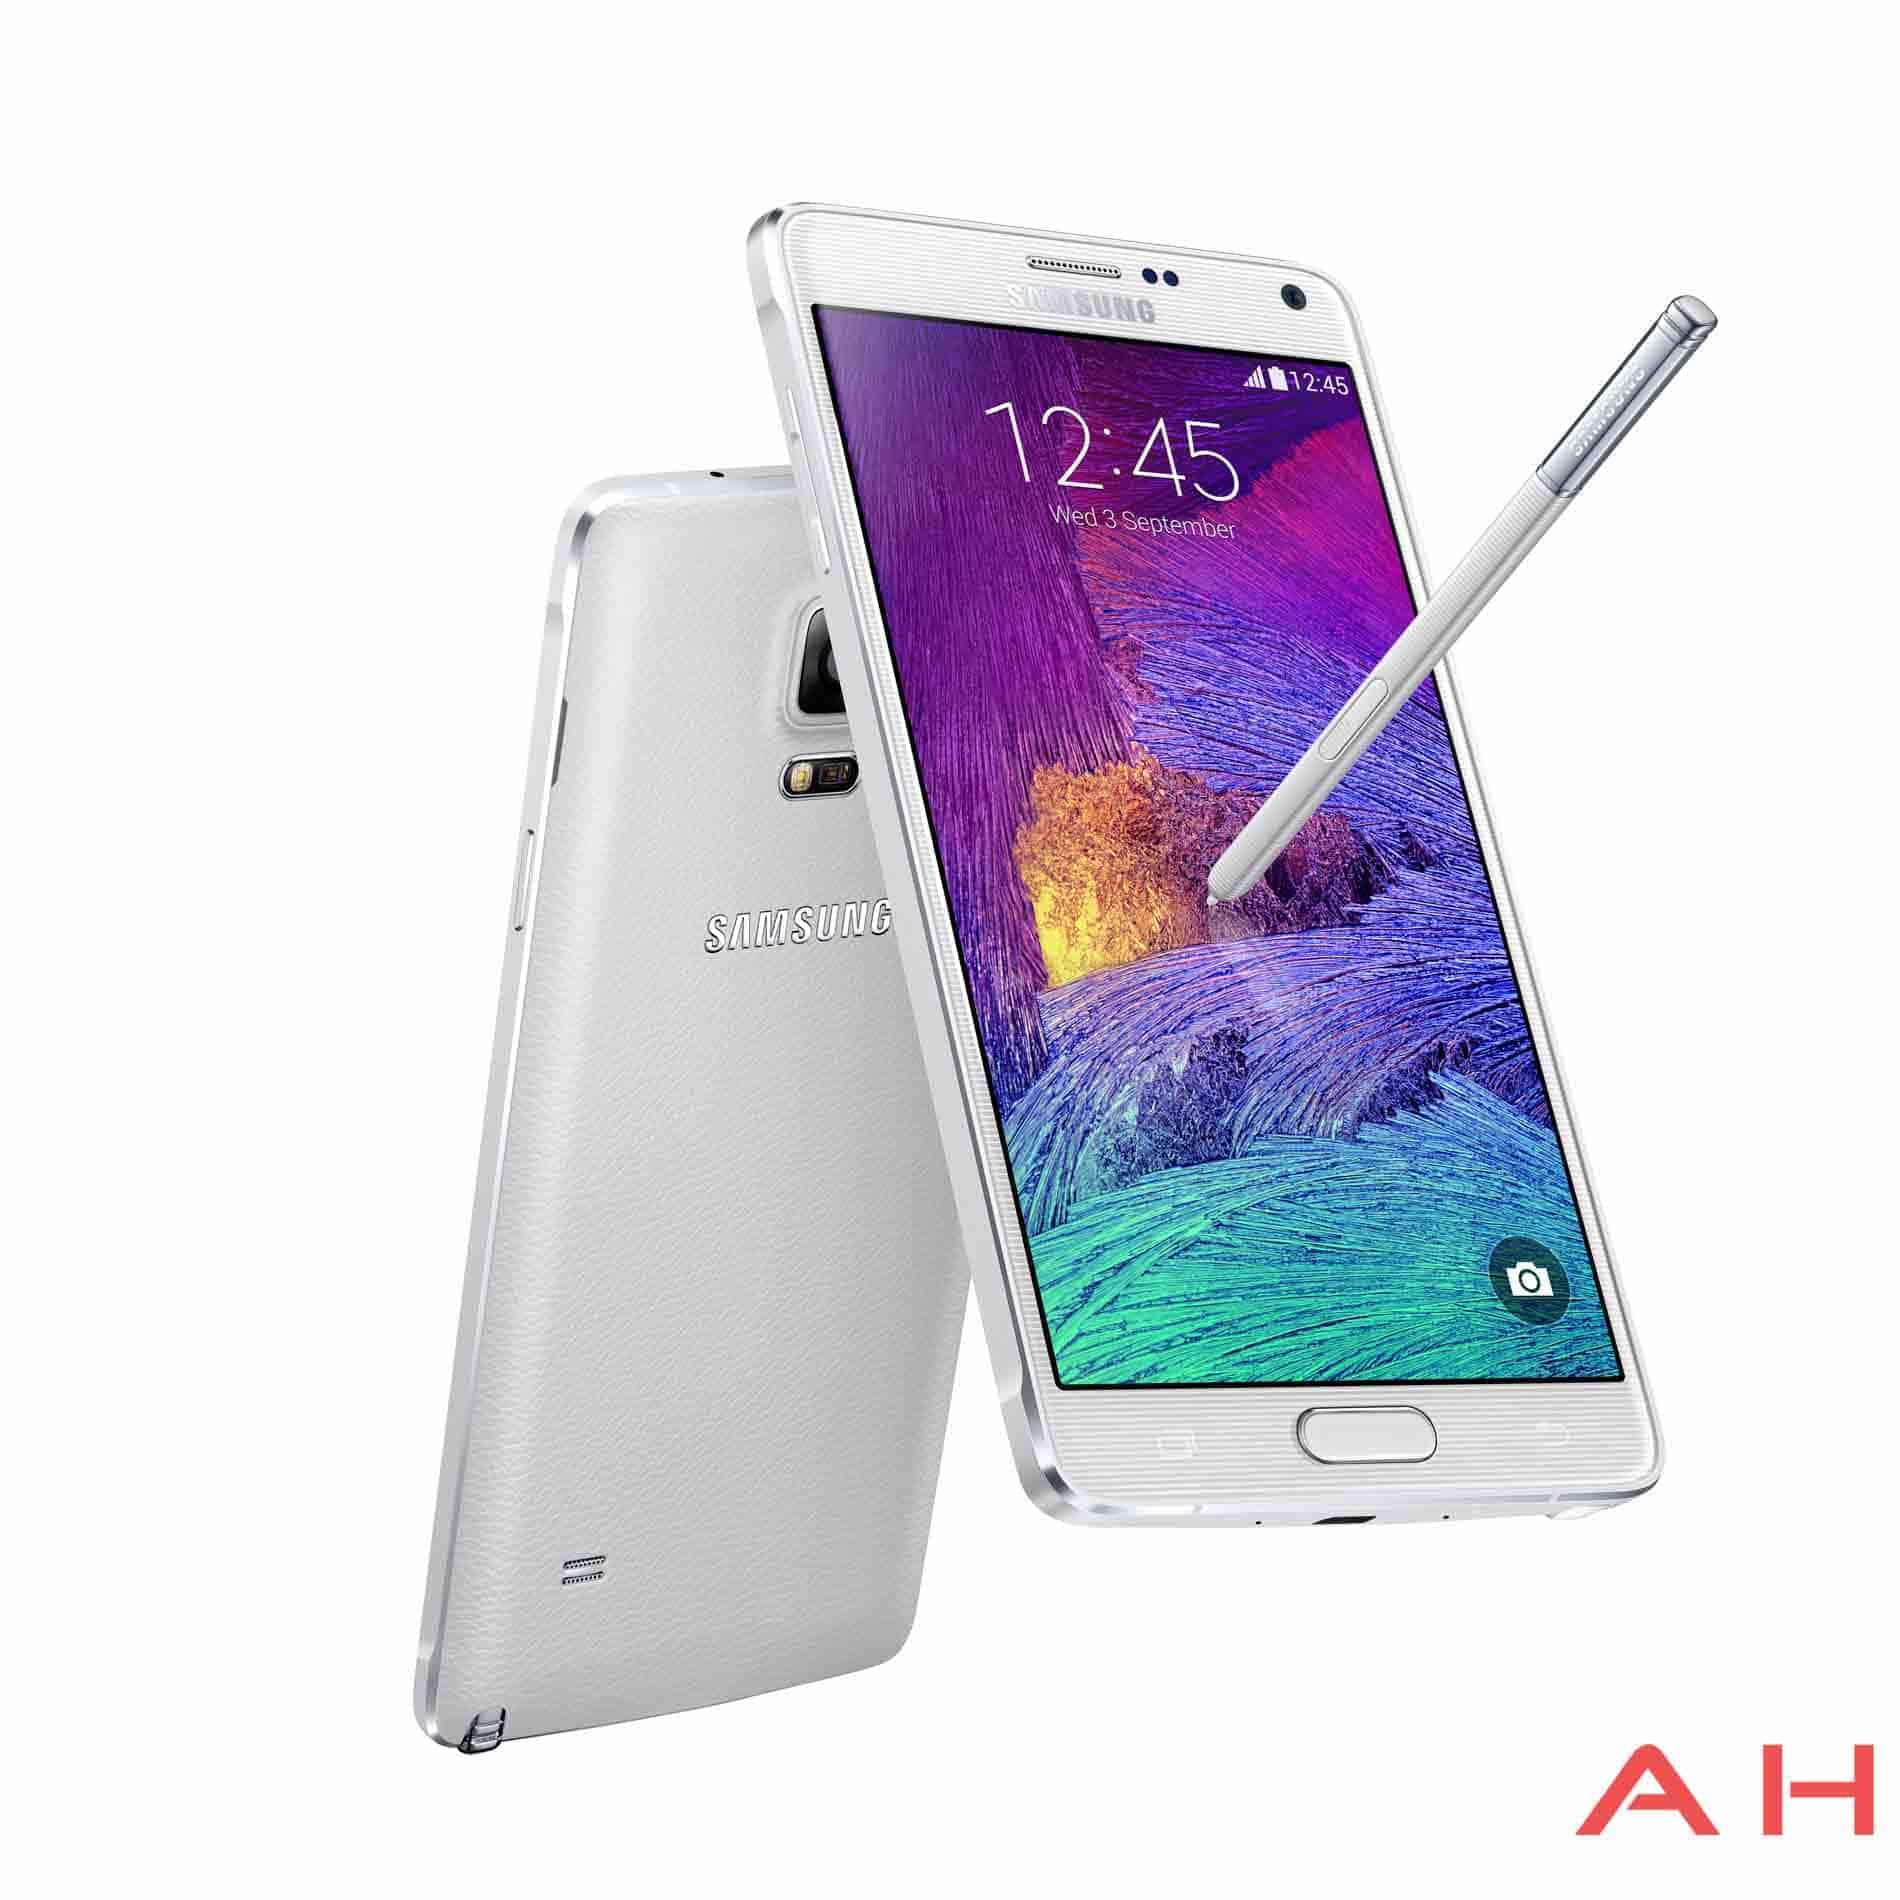 Samsung-Galaxy-Note-4-AH-11